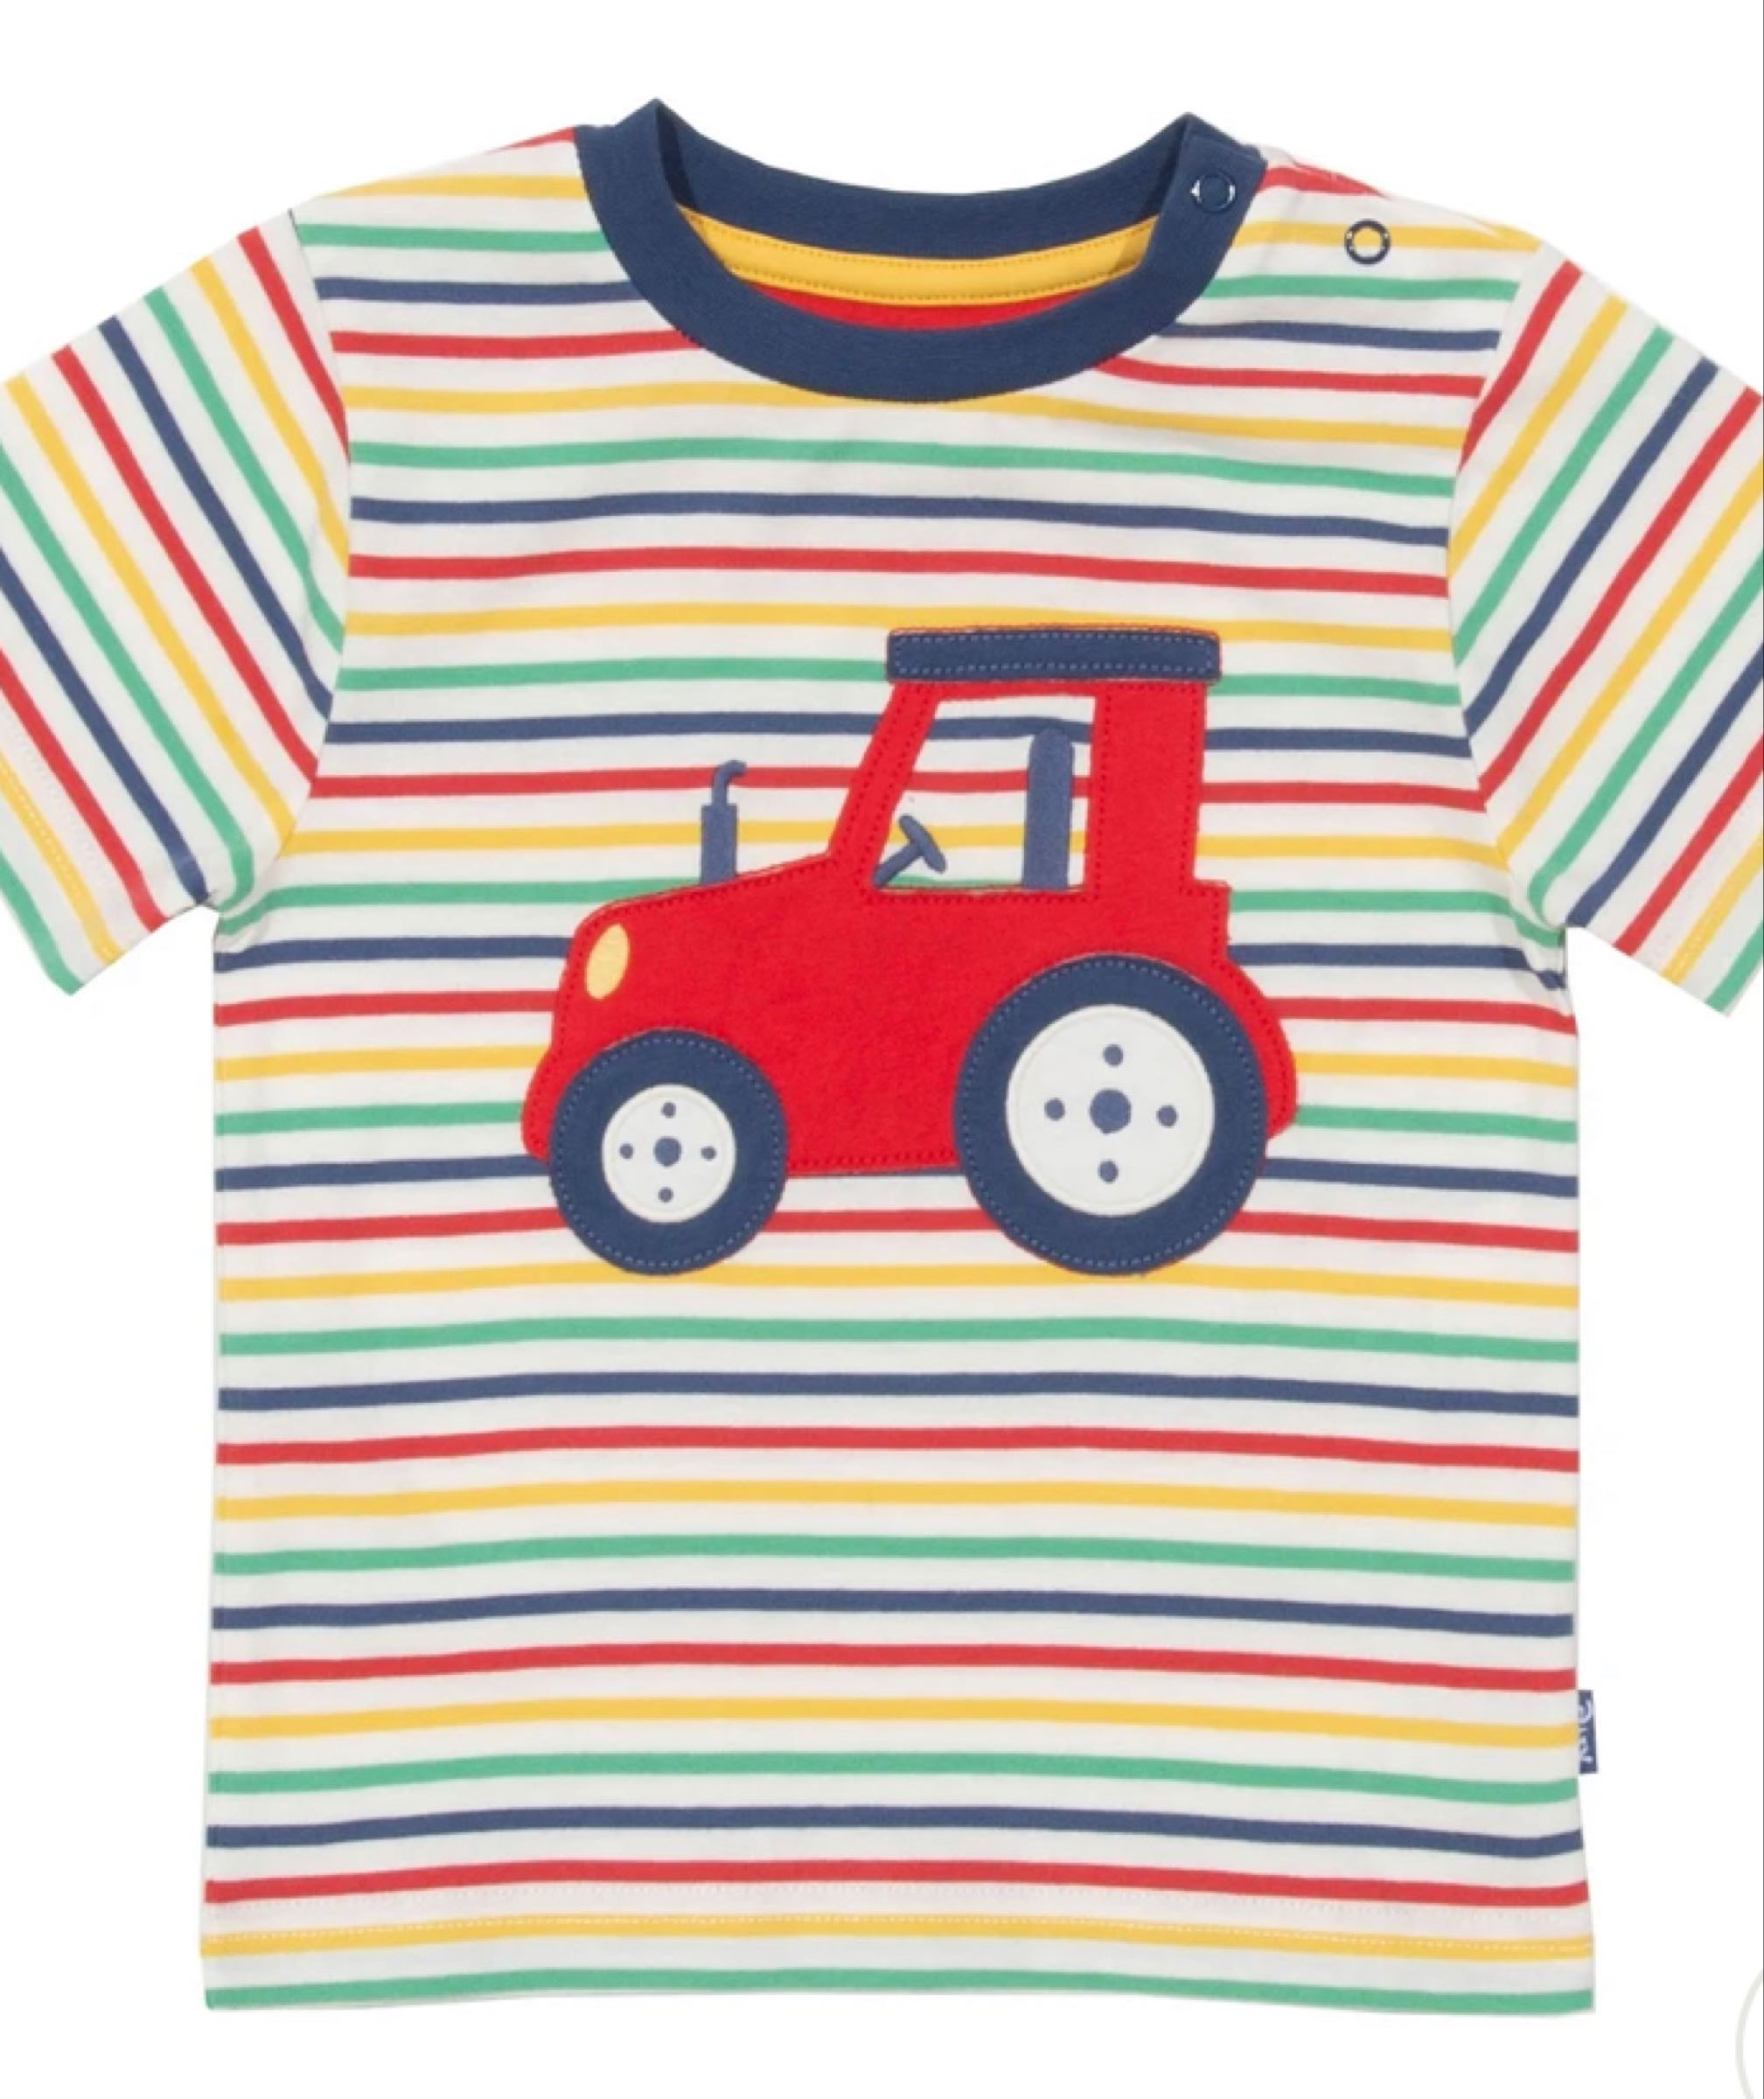 Farm play t-shirt